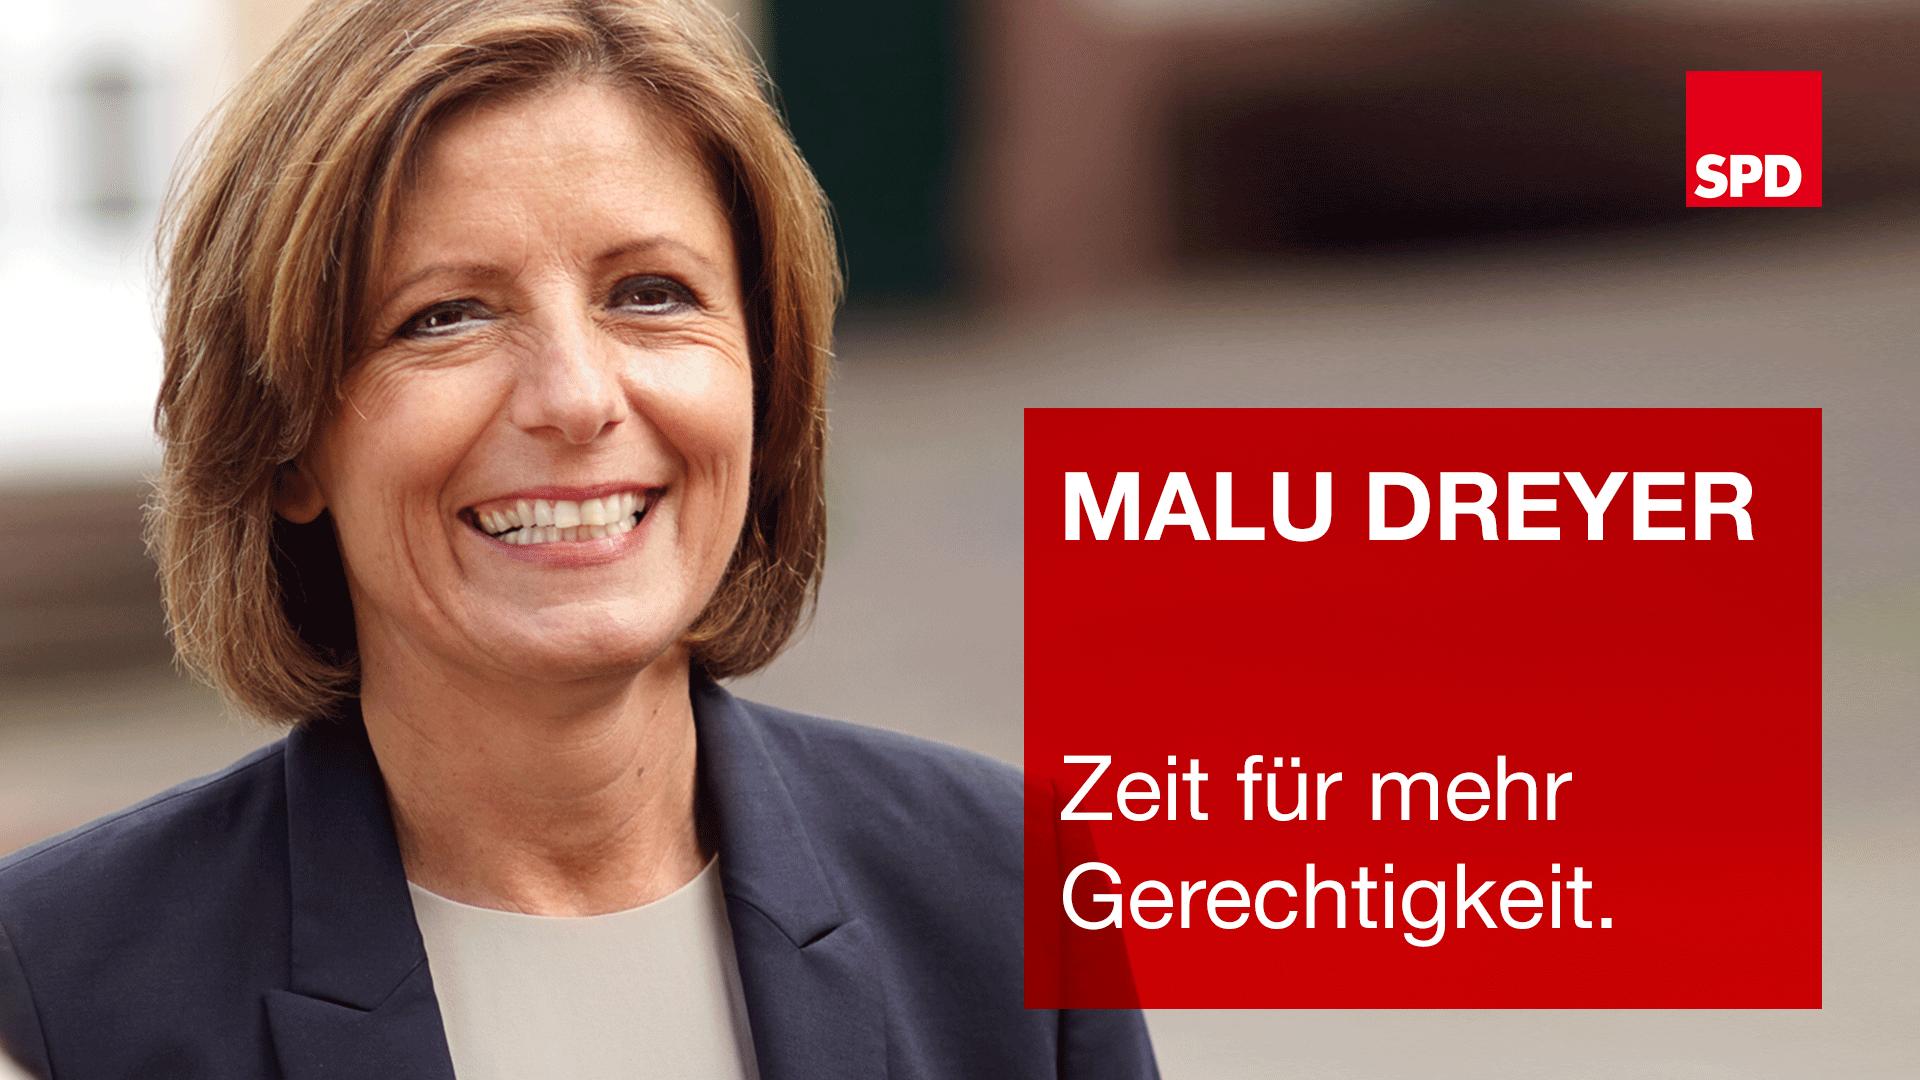 Malu Dreyer geht auf Wahlkampf-Tour